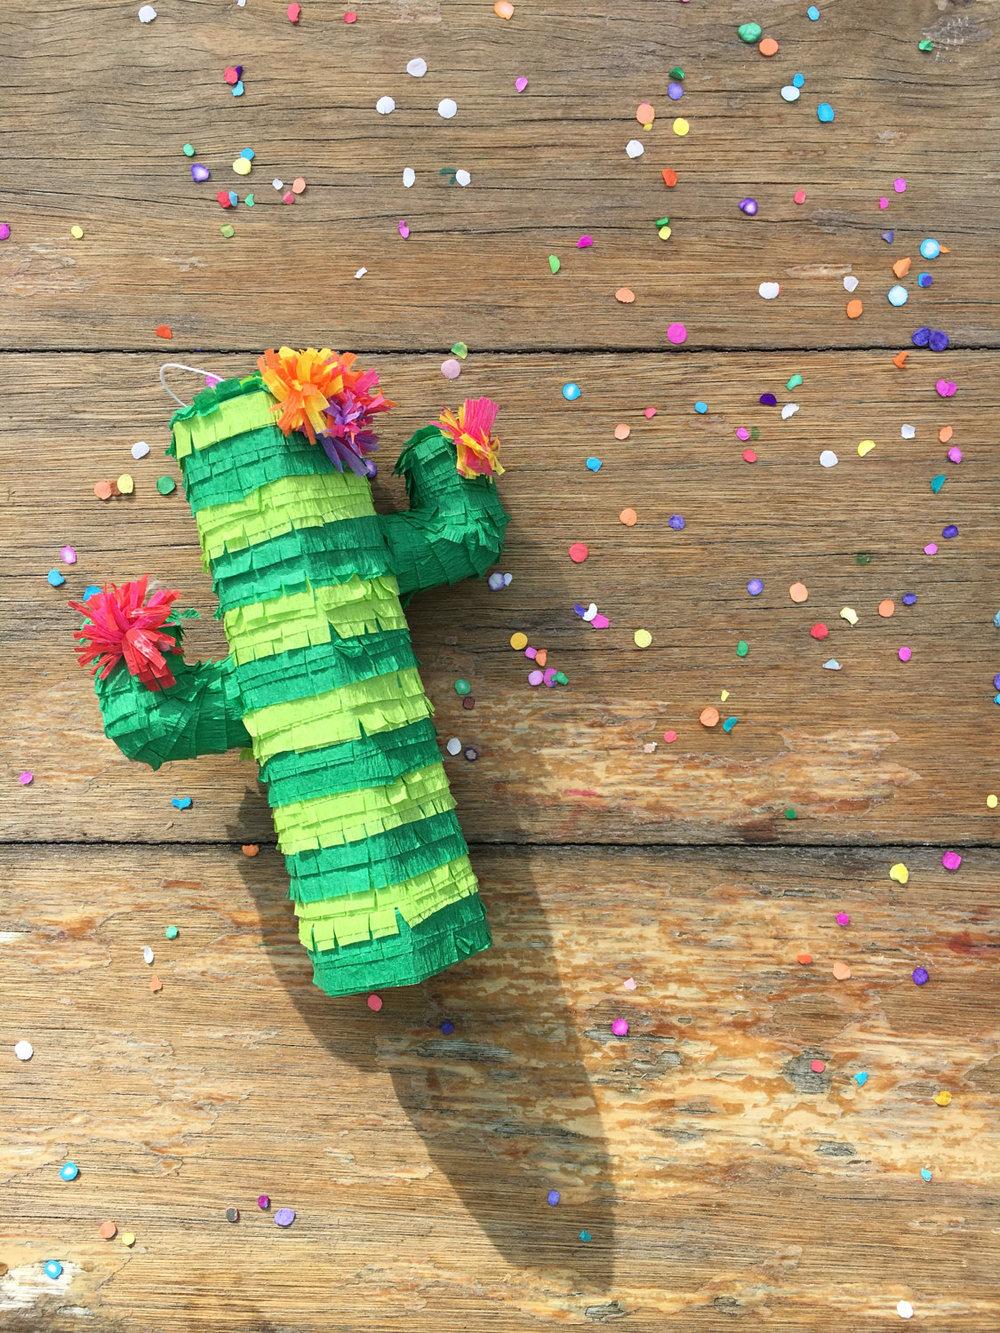 cactus-themed-wedding-ideas-pinata.jpg